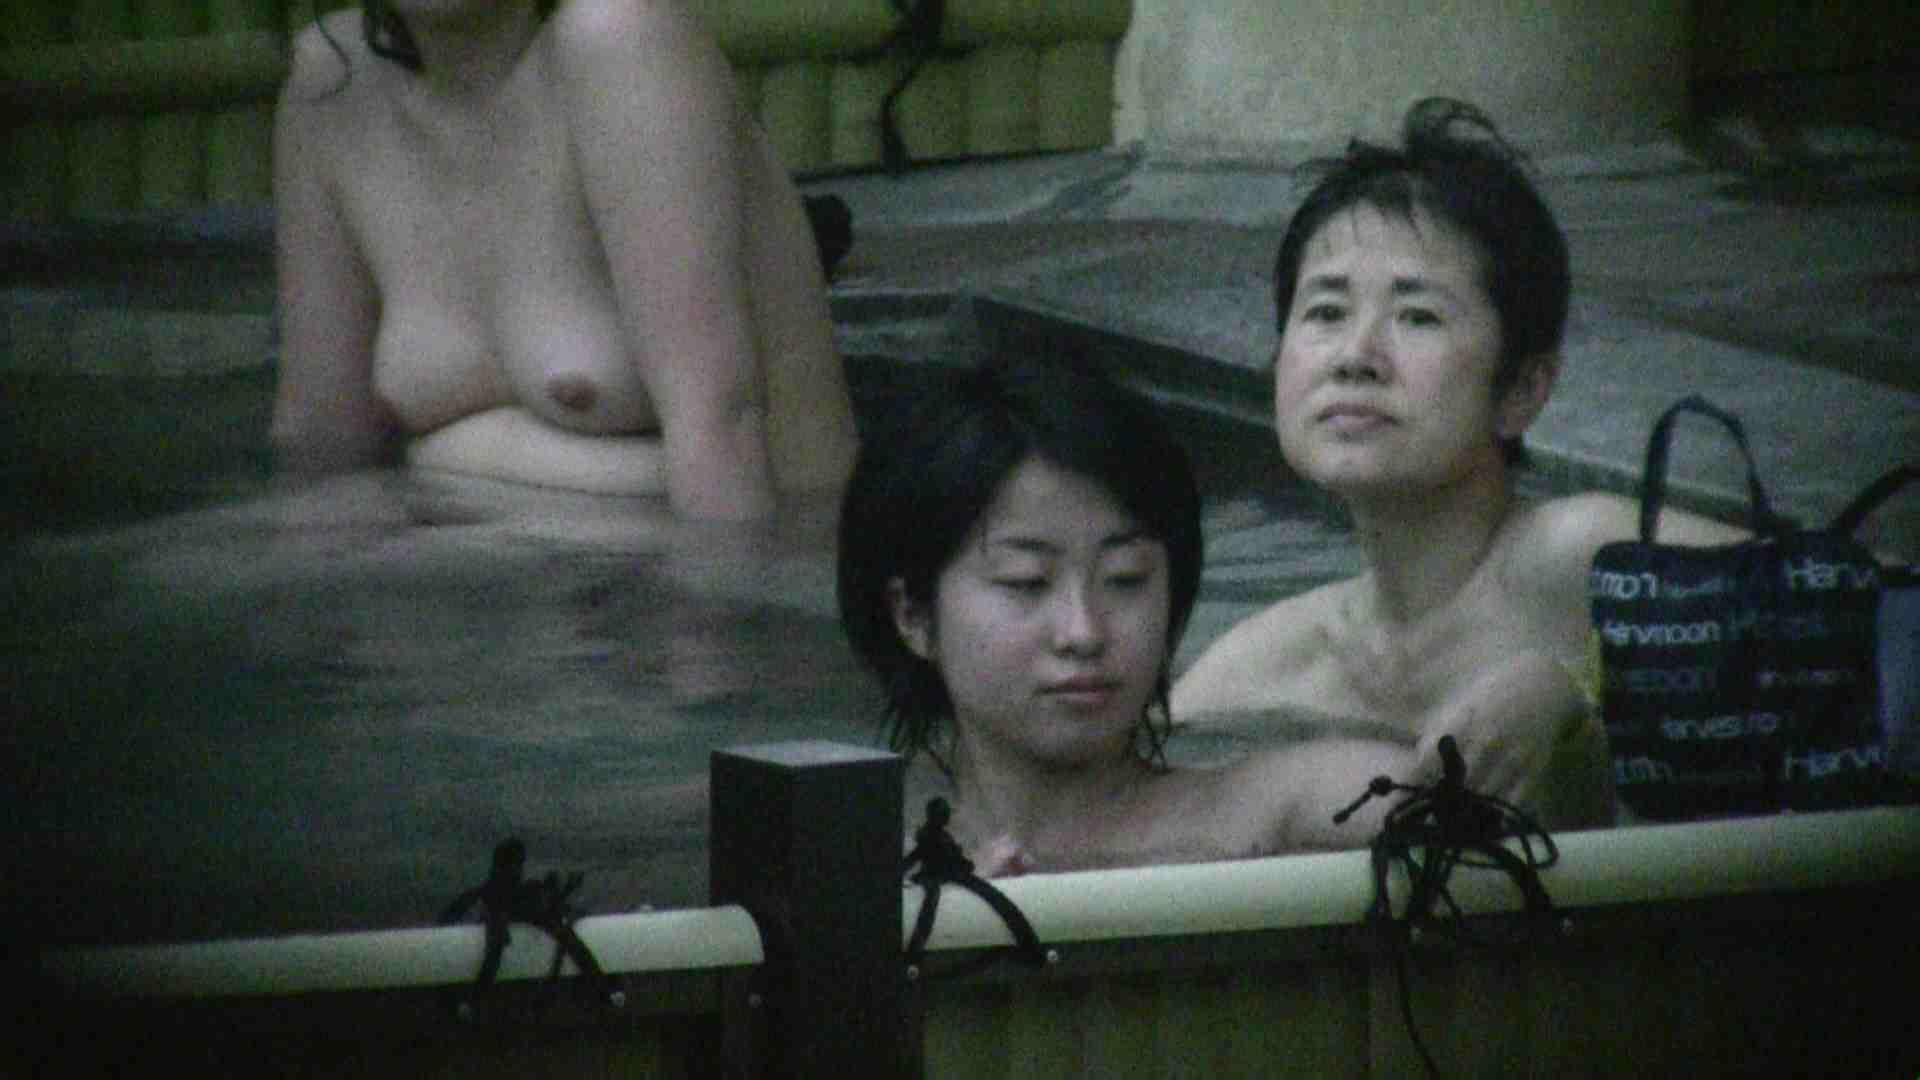 Aquaな露天風呂Vol.112 0 | 0  68連発 3